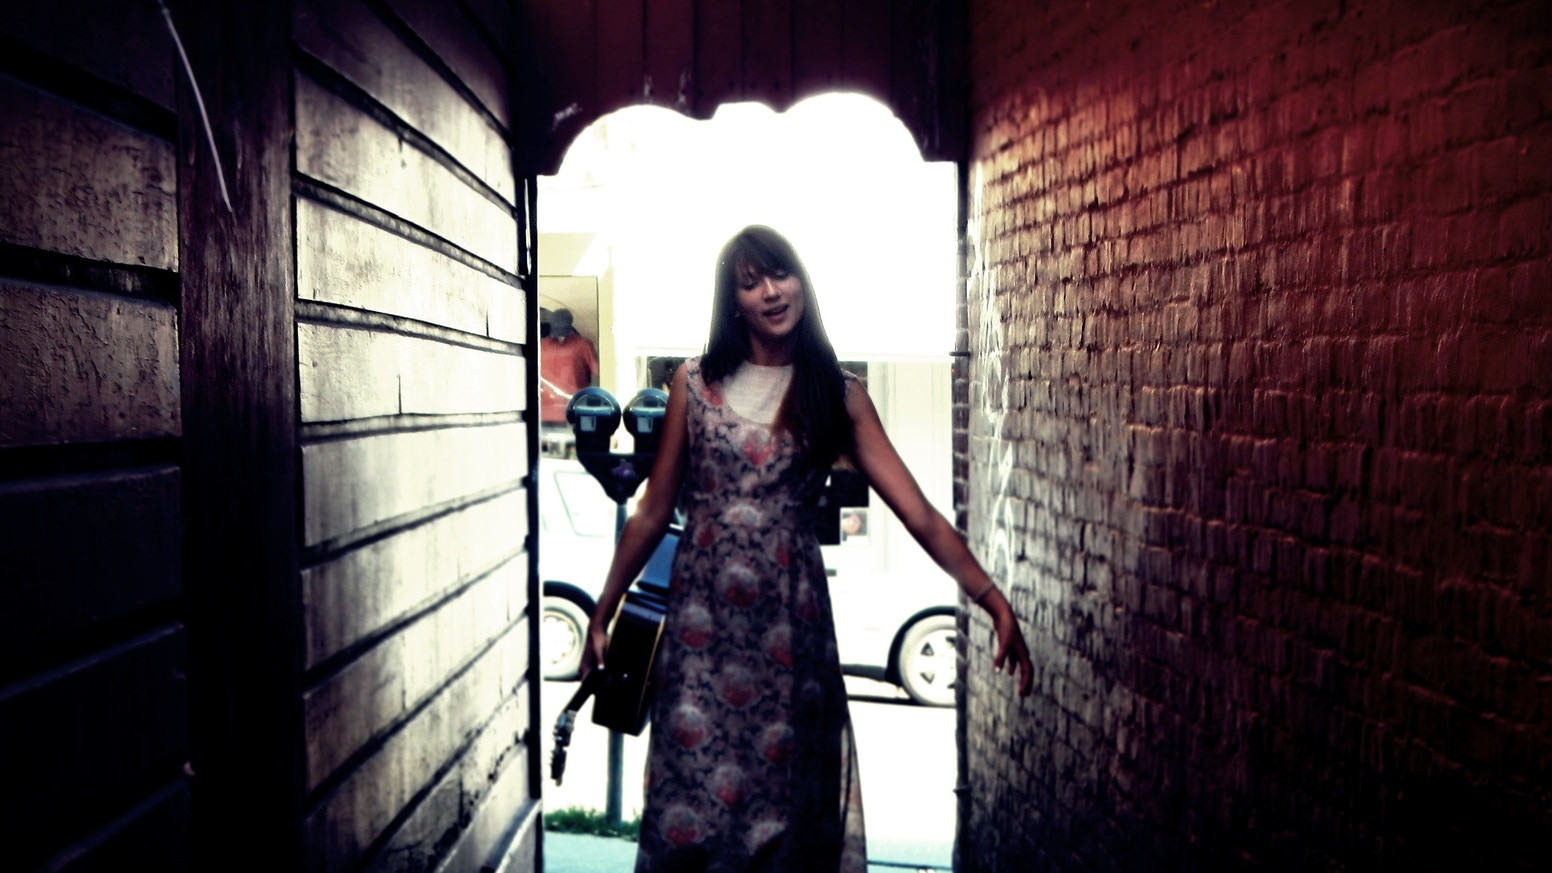 Davia's Debut EP by Kerri Pratschner » Free Download! — Kickstarter